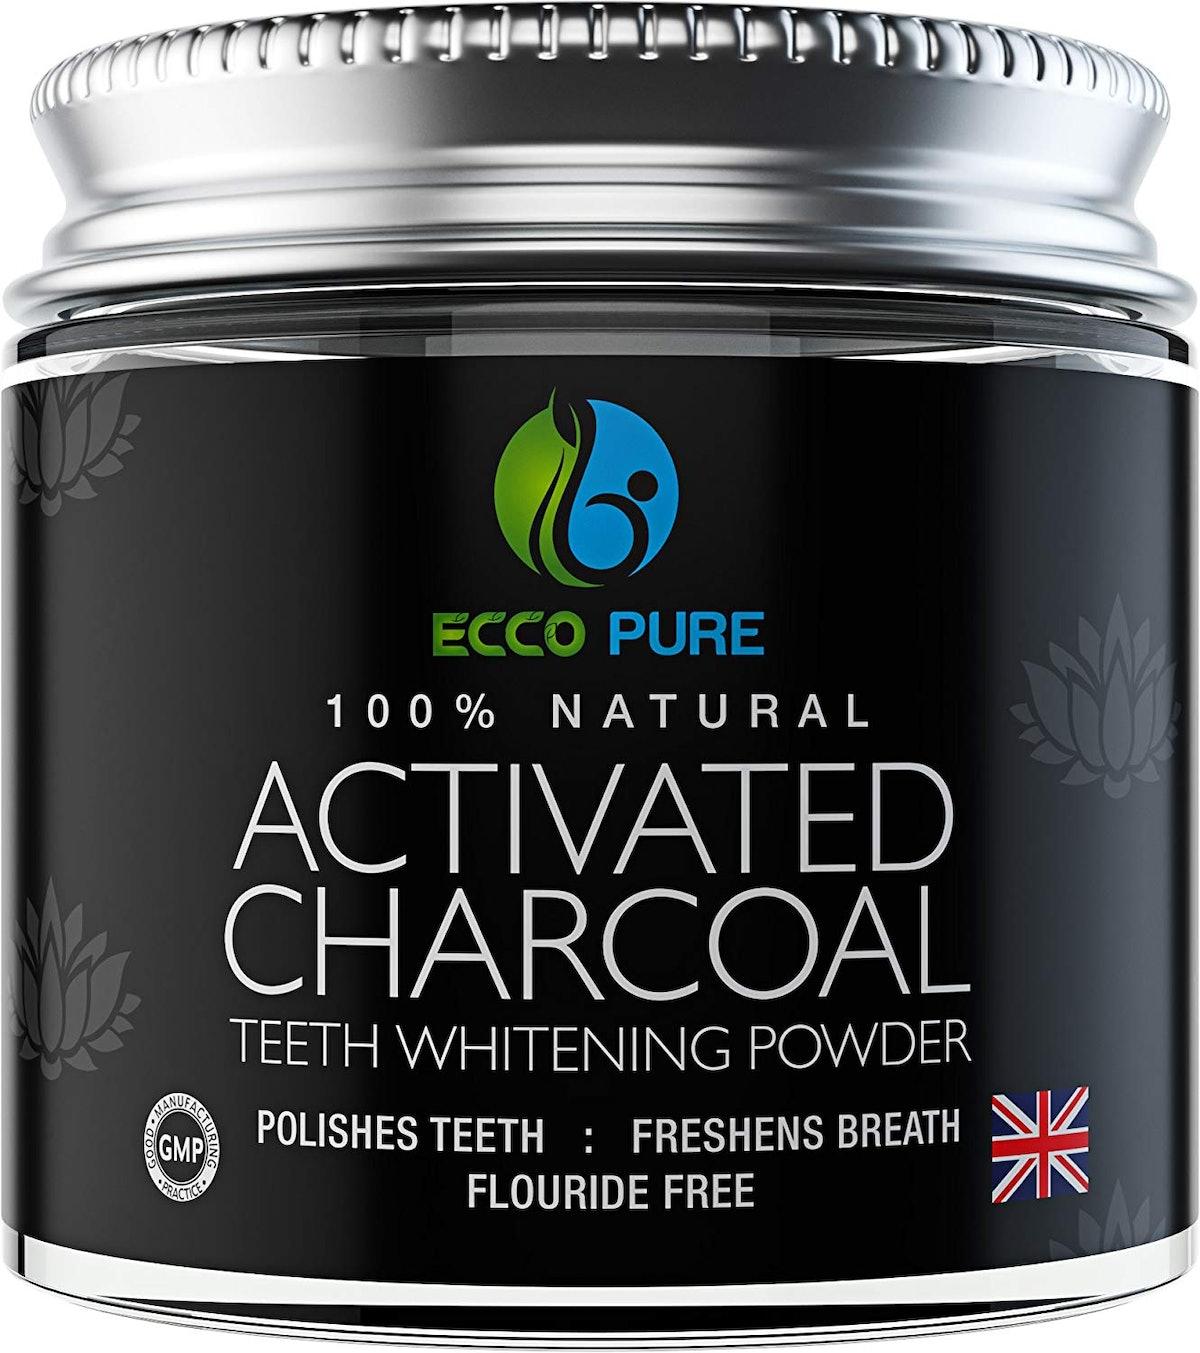 ECCO PURE Charcoal Teeth Whitening Powder